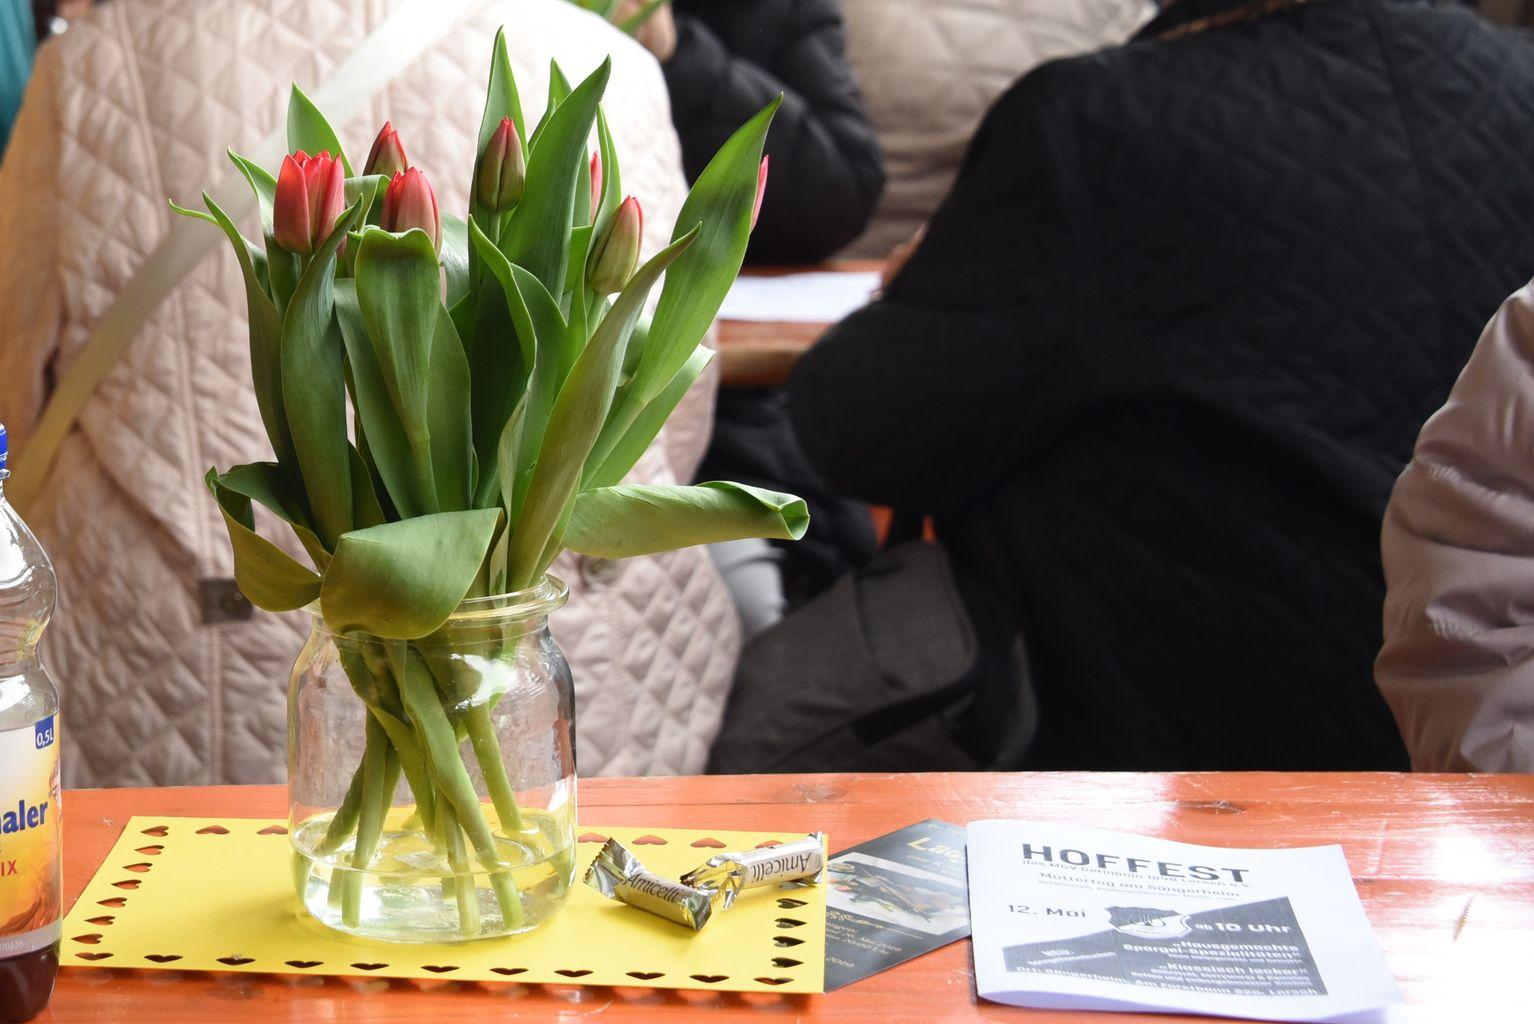 Germania-Hoffest am Muttertag